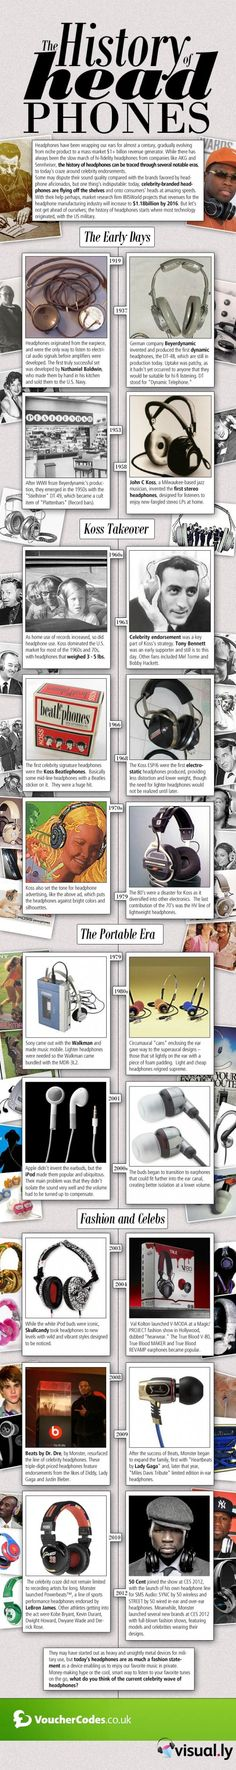 Audío - Historia de los Headphones